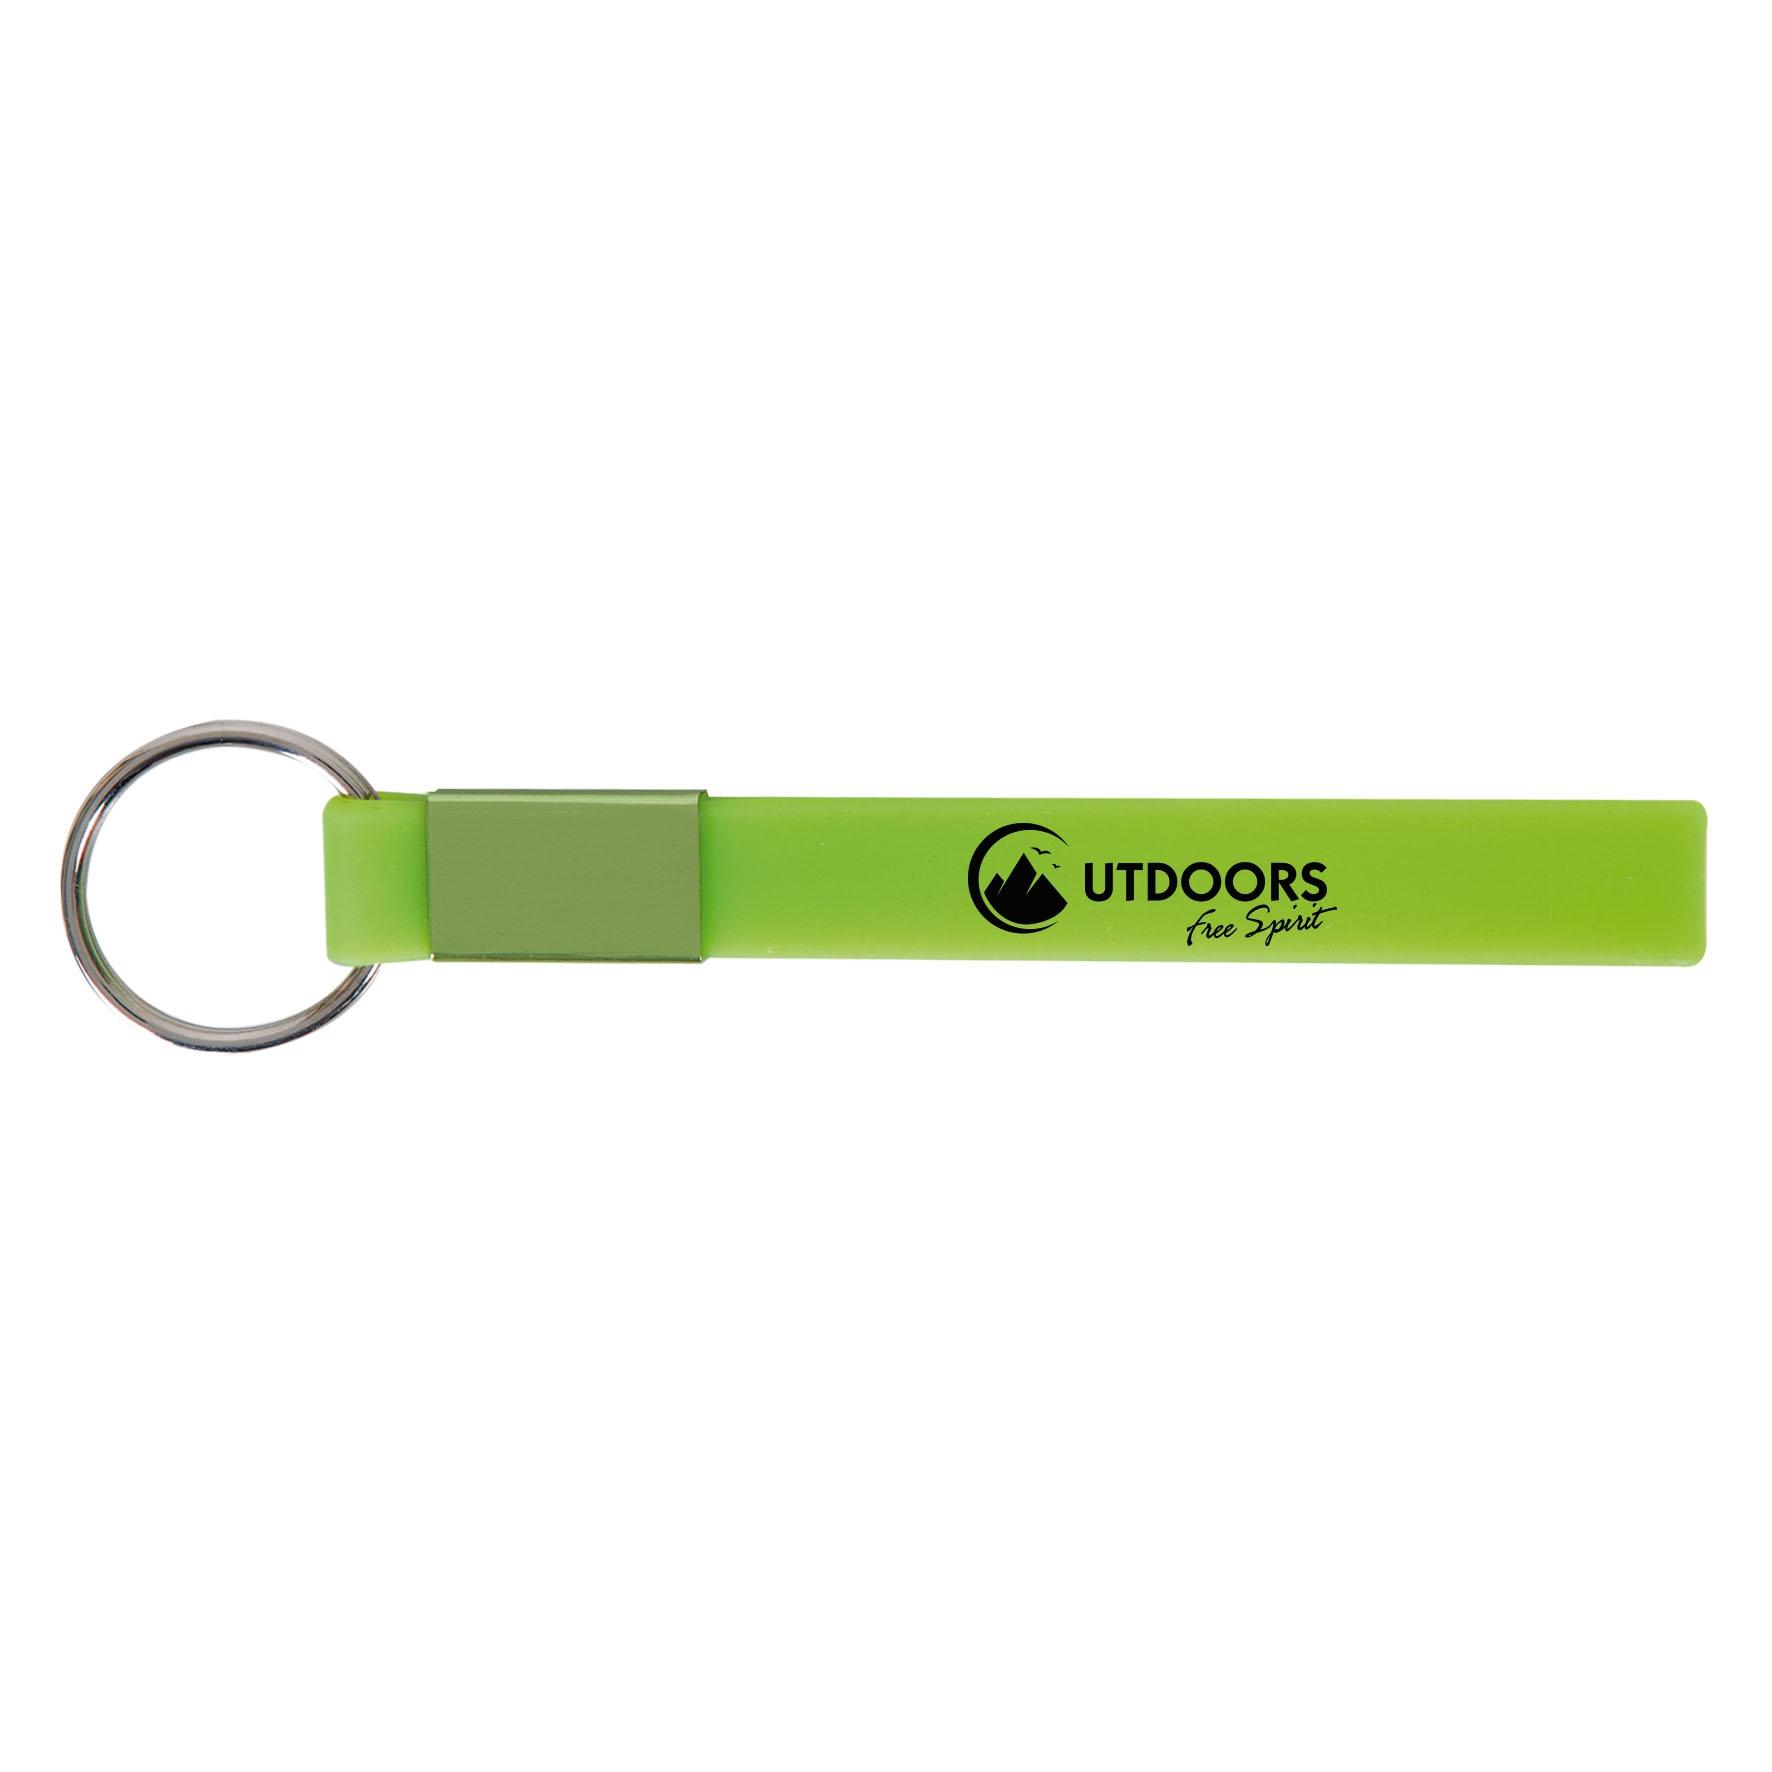 Goodies - Porte-clés publicitaire Lanyard silicone - vert anis